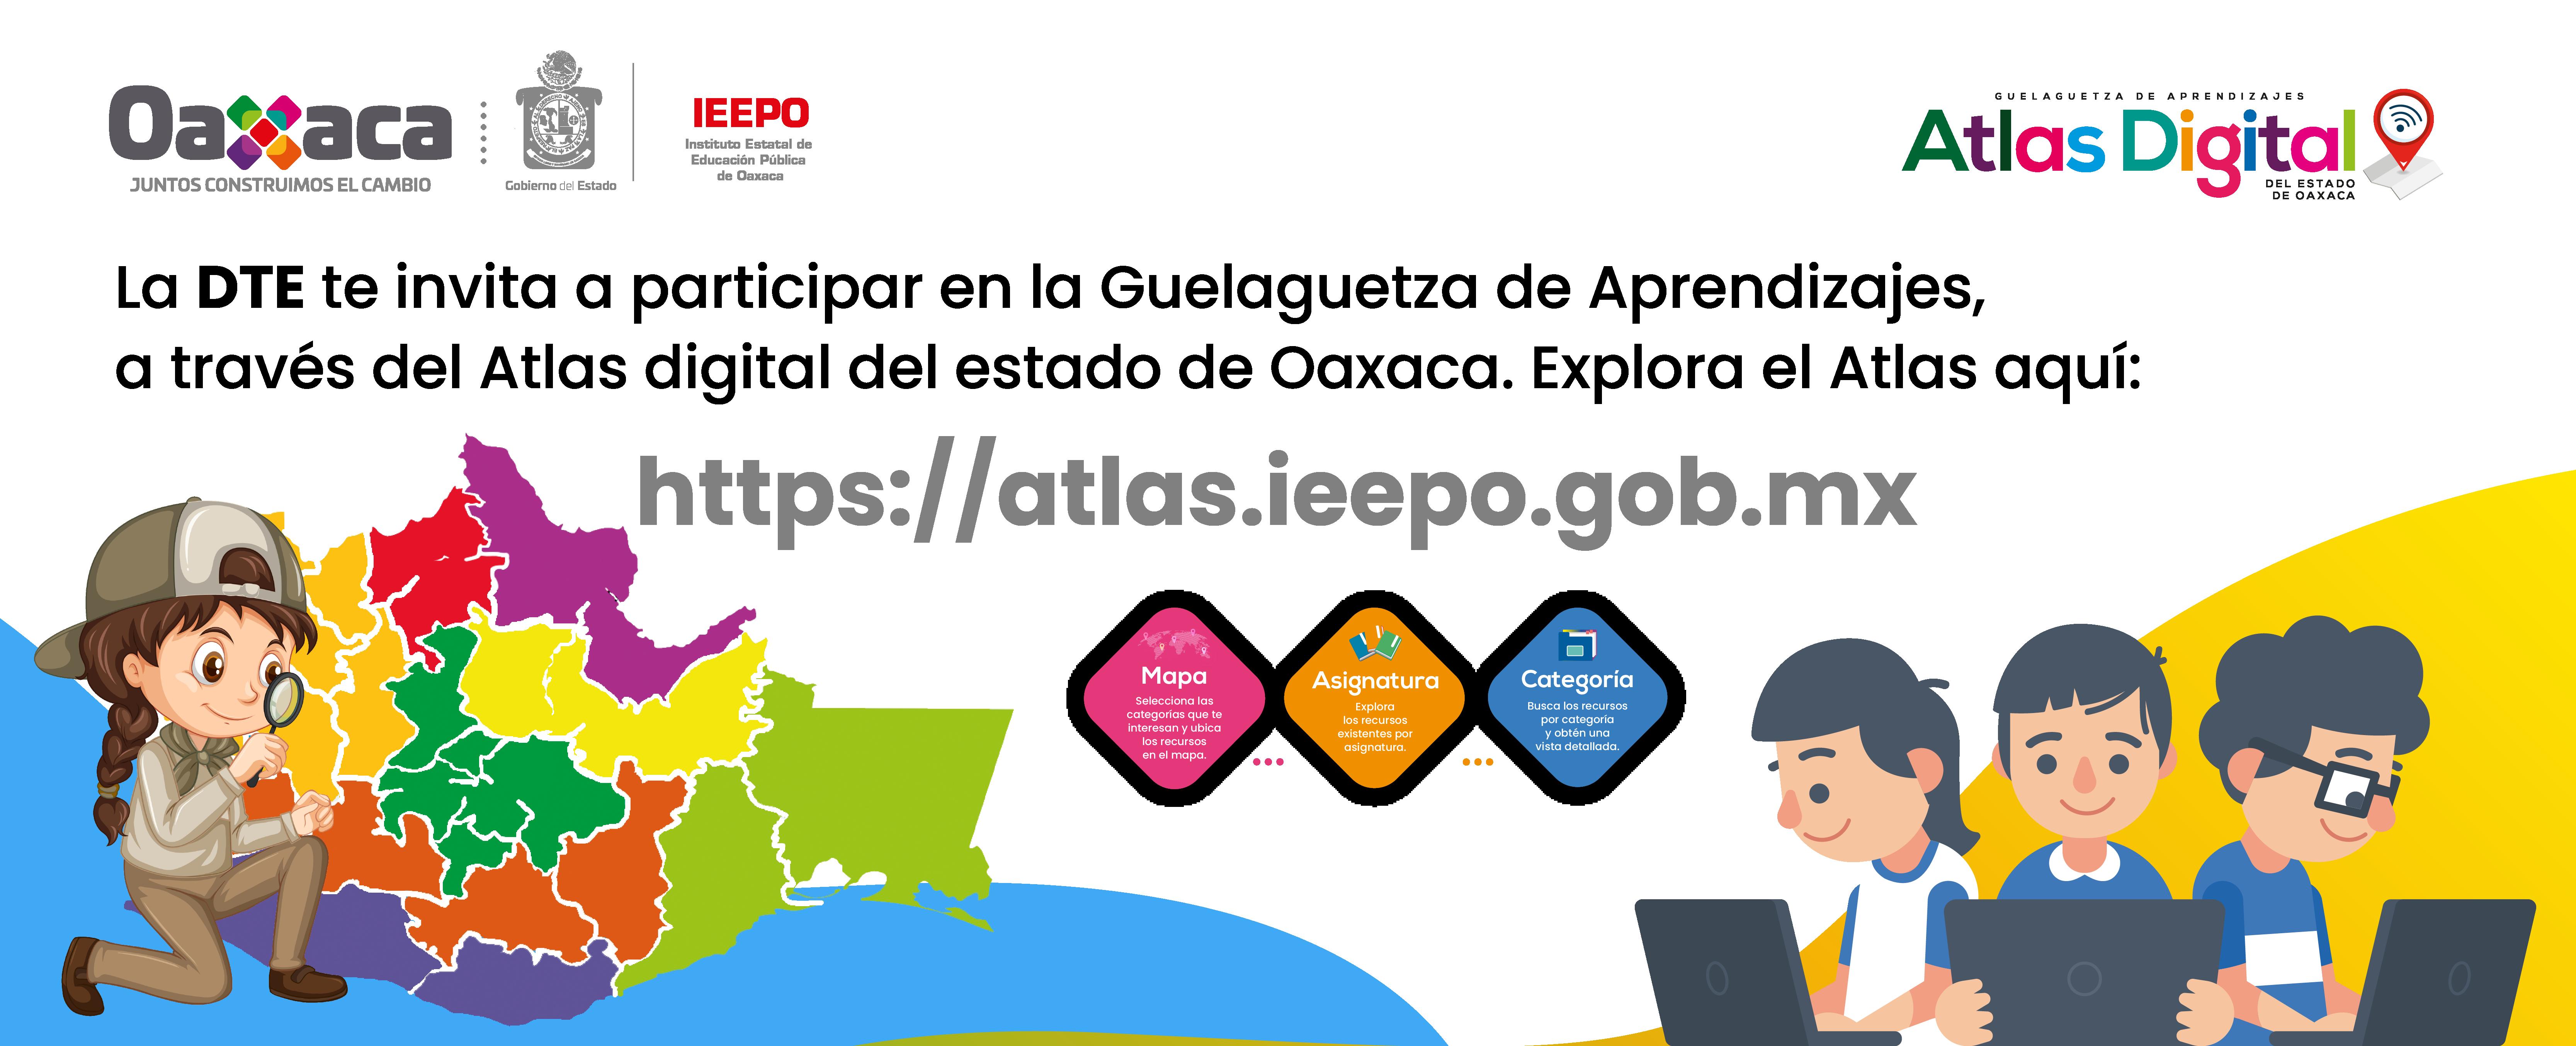 Guelaguetza de aprendizajes Atlas digital del estado de Oaxaca